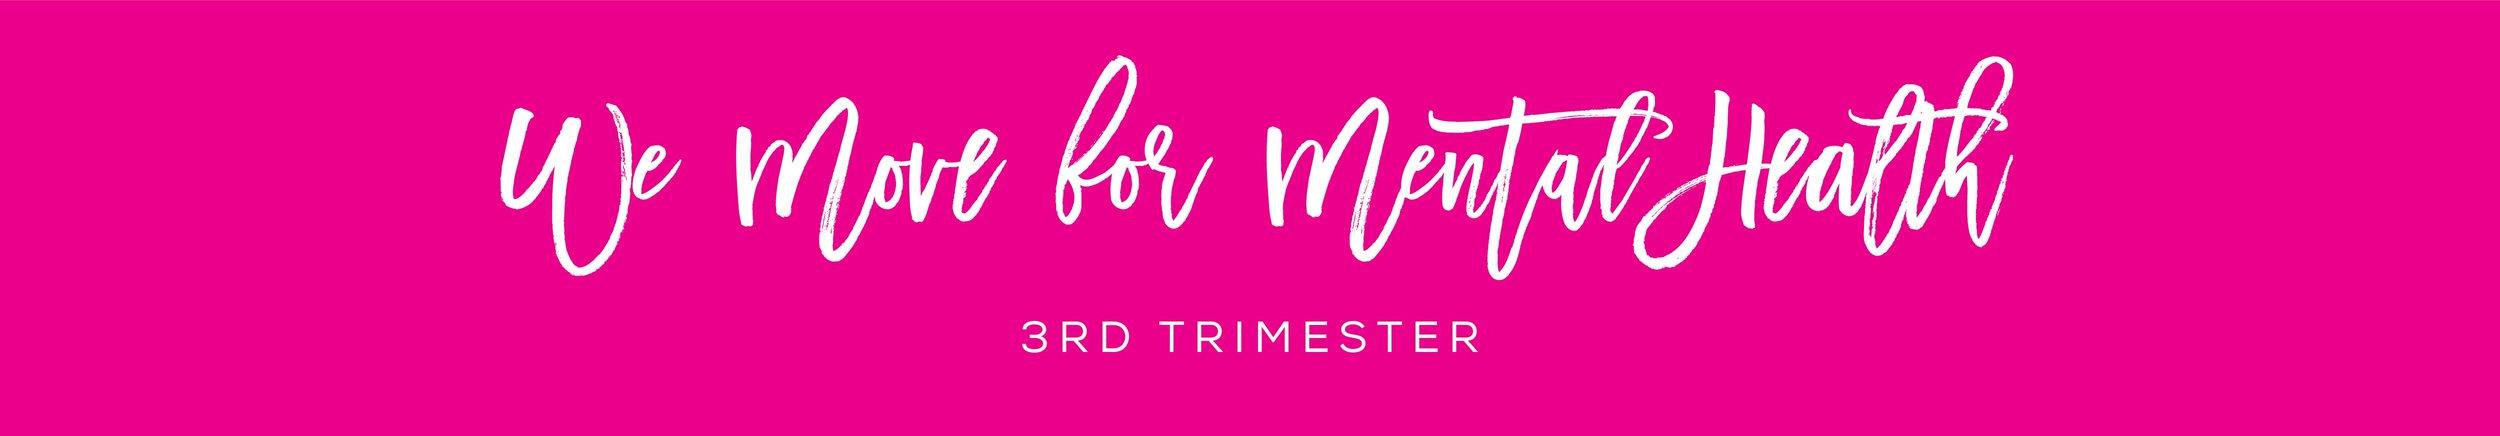 TMR_Web_ProgramHeader_WM4MH_3rd Tri_Pink-01.jpg